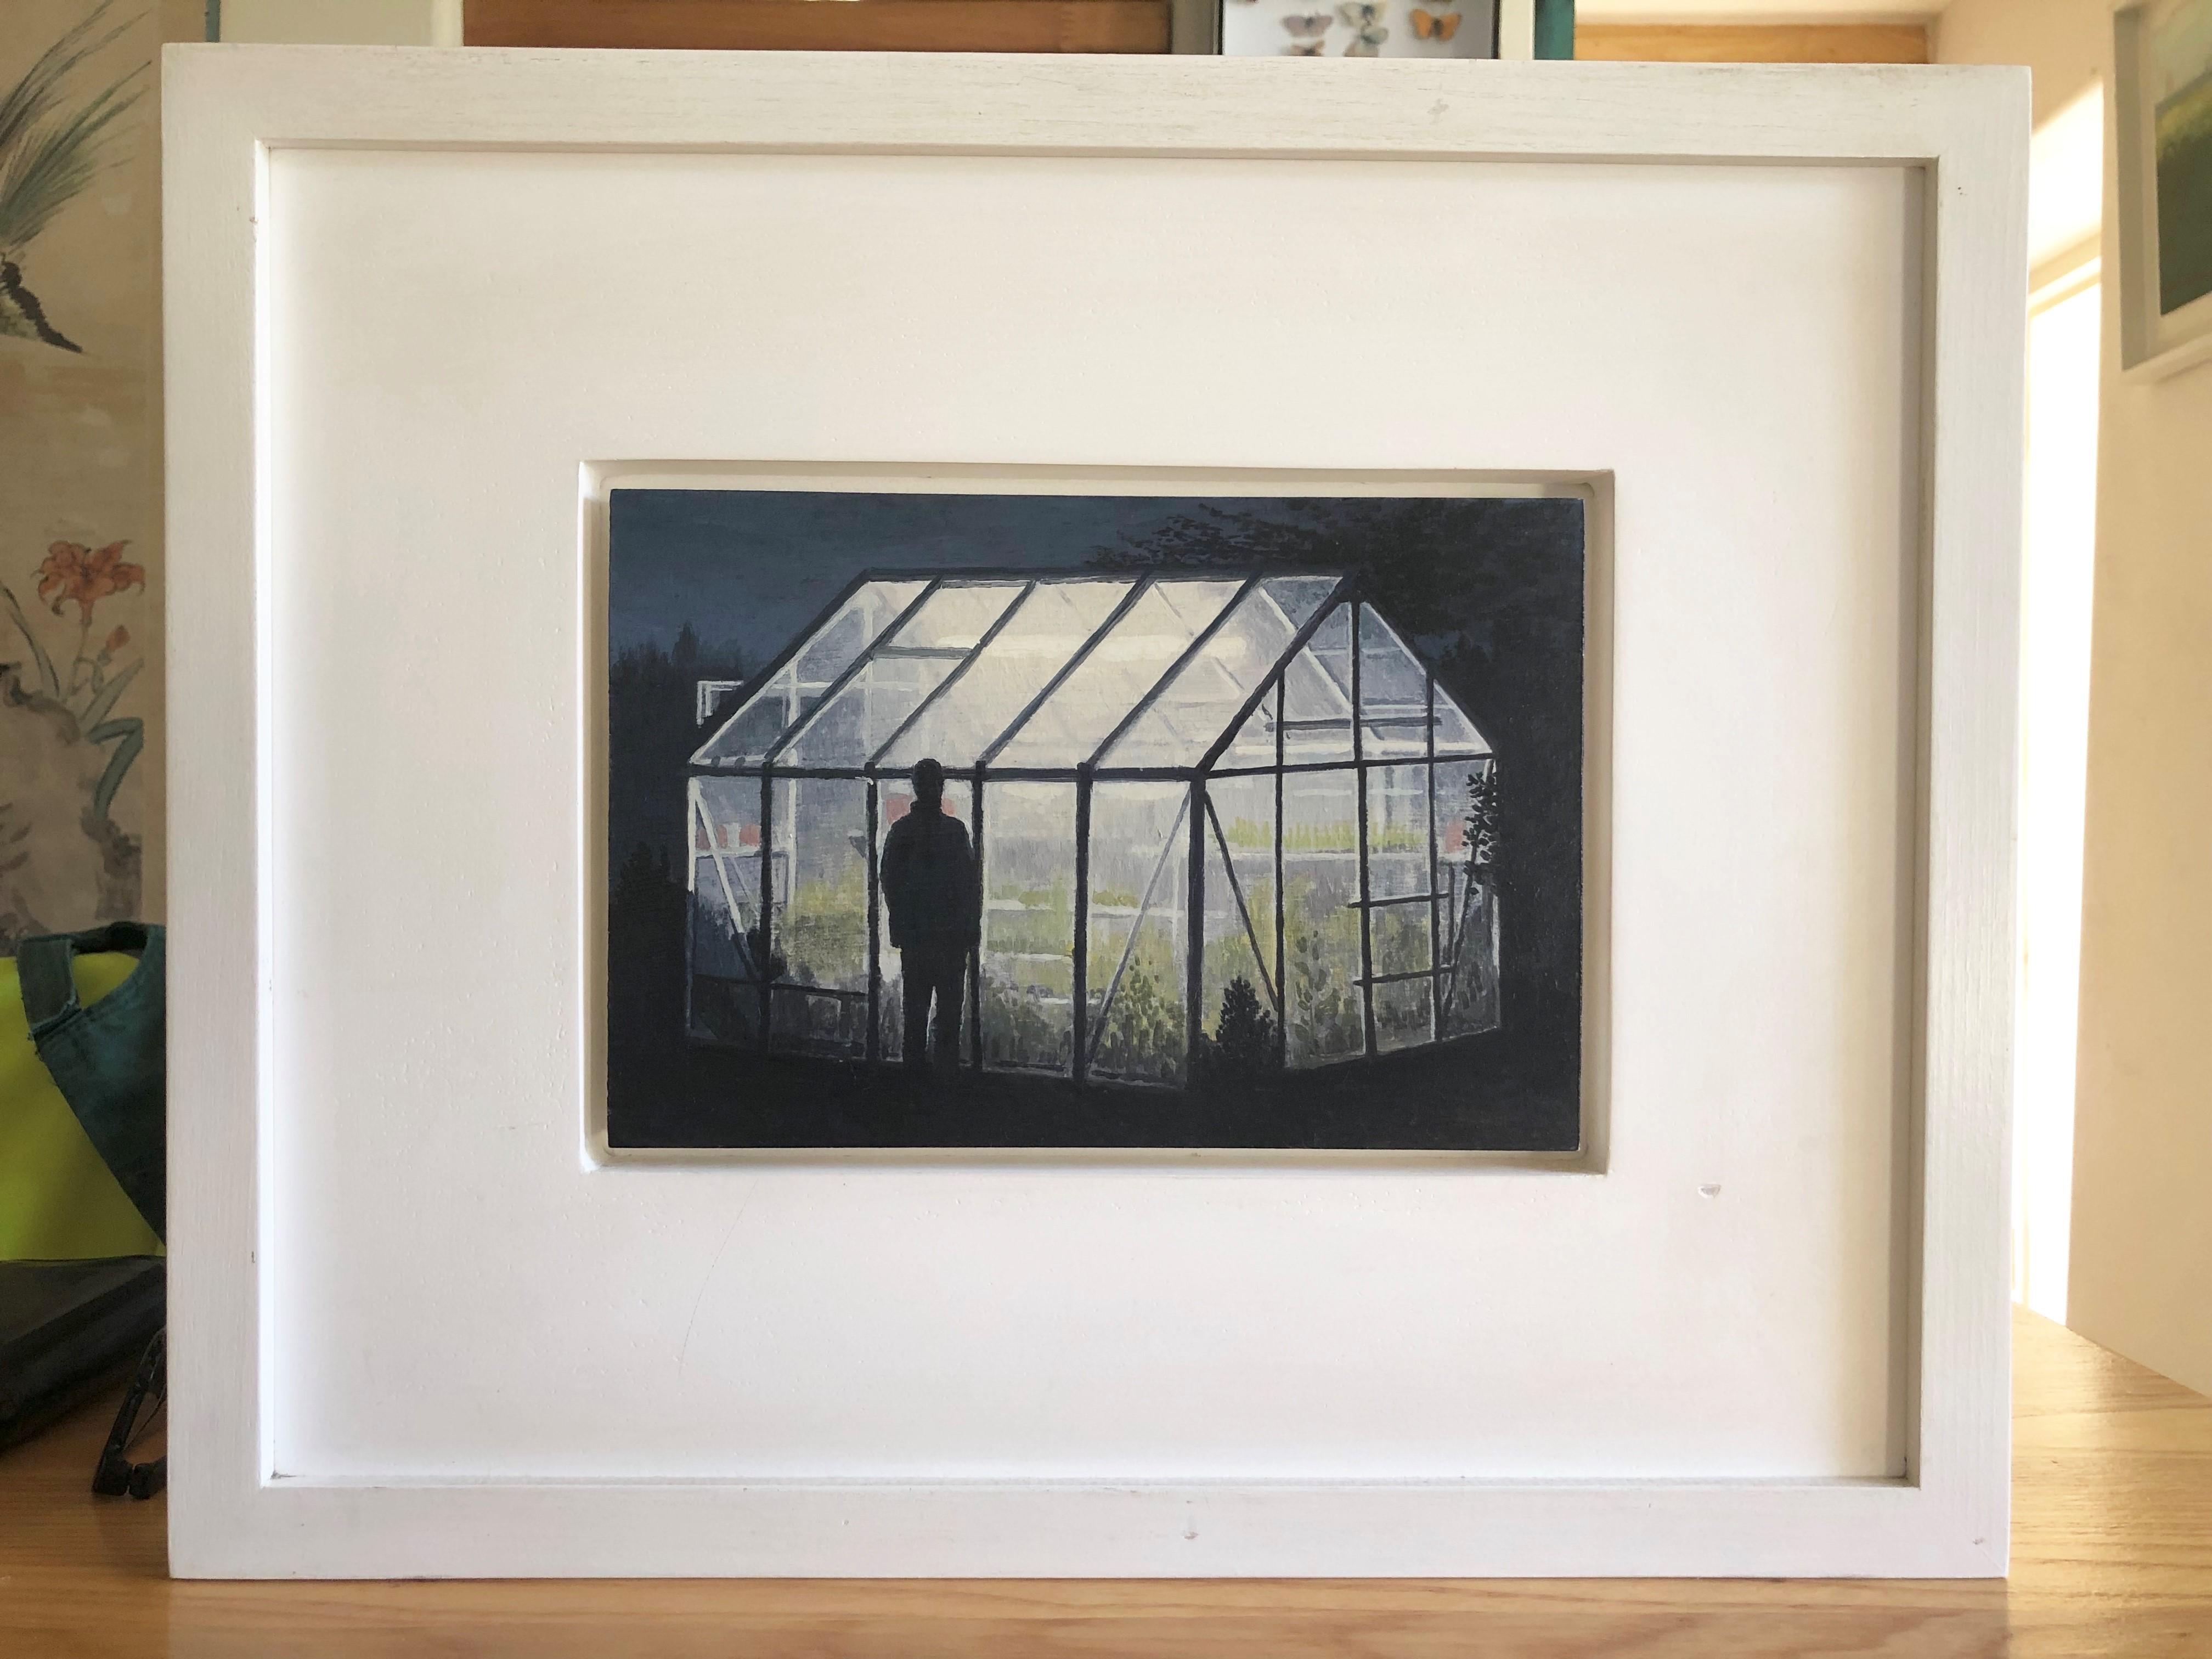 Lot 044 - Barry McGlashan (Scottish b.1974) oil on pane 'Looking Glass House', 115cm x 22cm, Provenance,